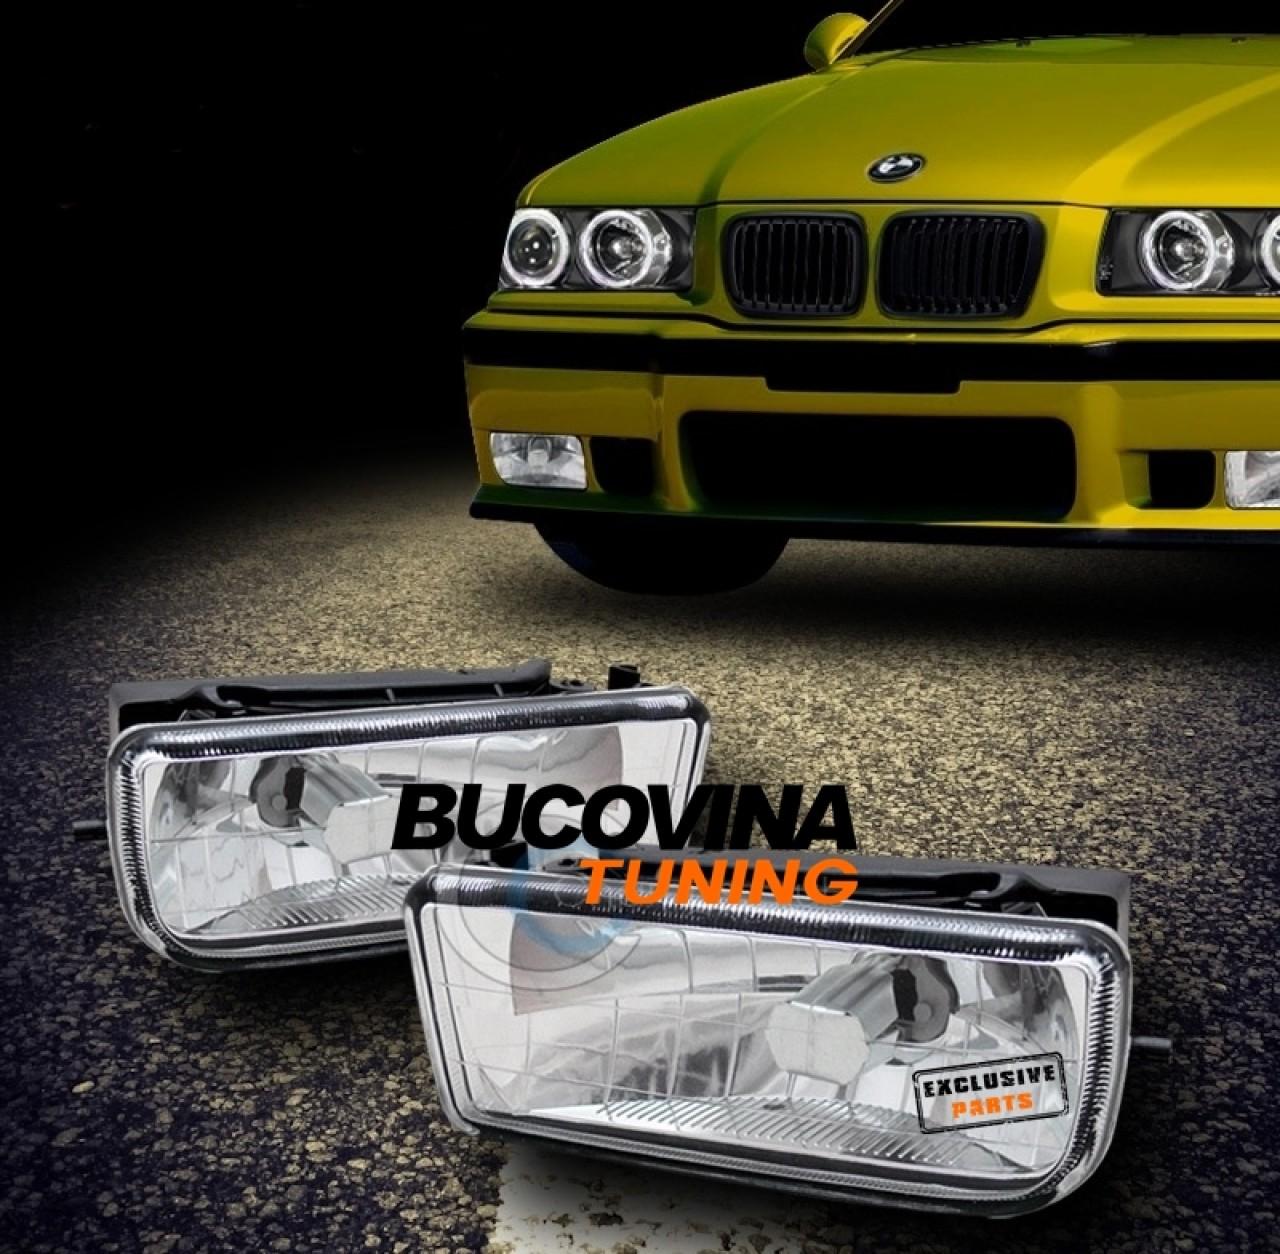 PROIECTOARE CEATA BMW SERIA 3 E36 (91-97)